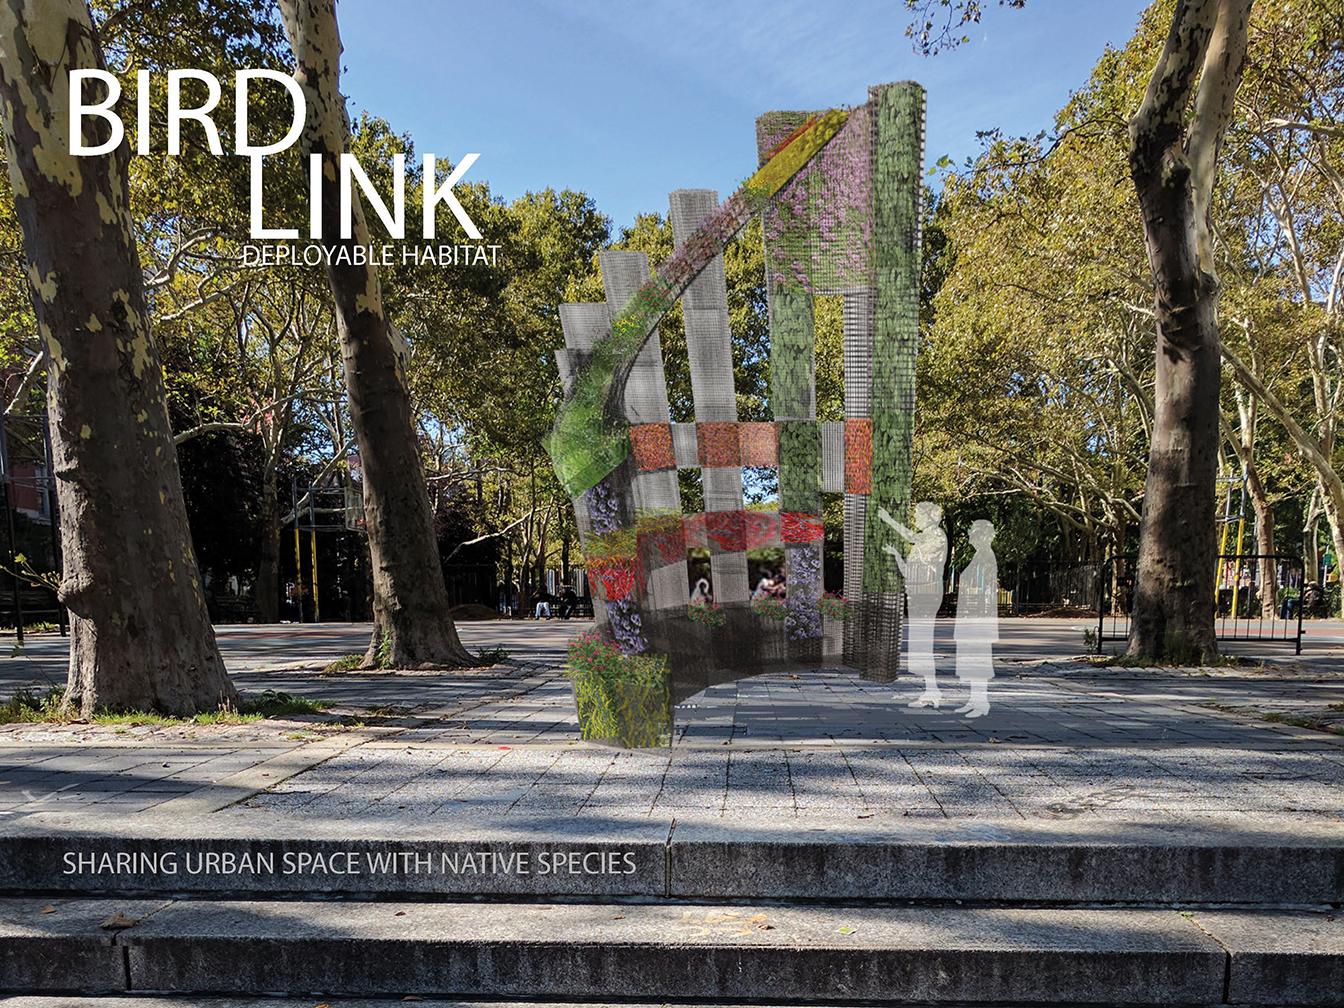 BIRDLINK native plant garden constructed habitat Sara D. Roosevelt Park 2018